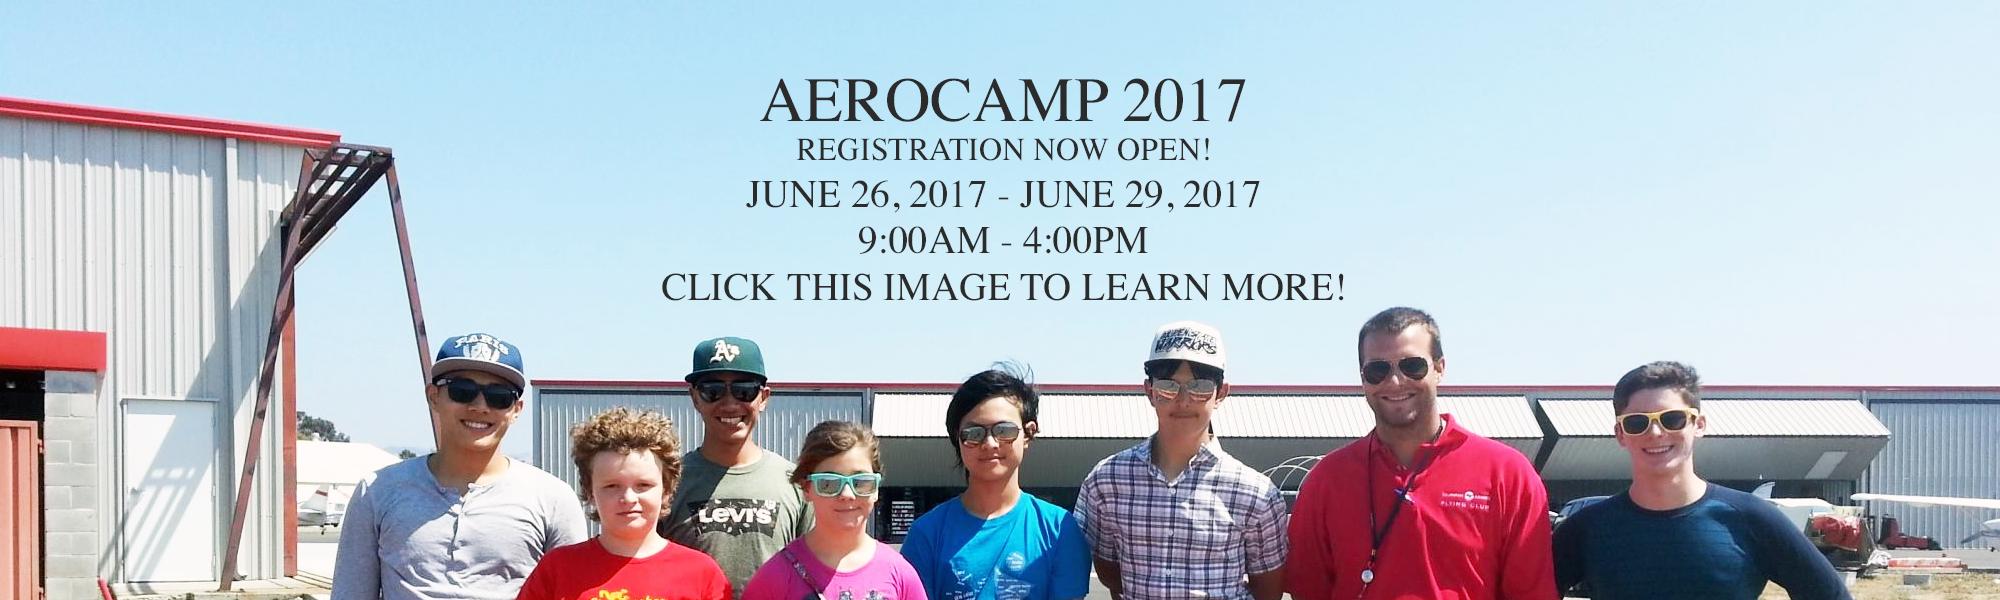 AEROCAMP-2017